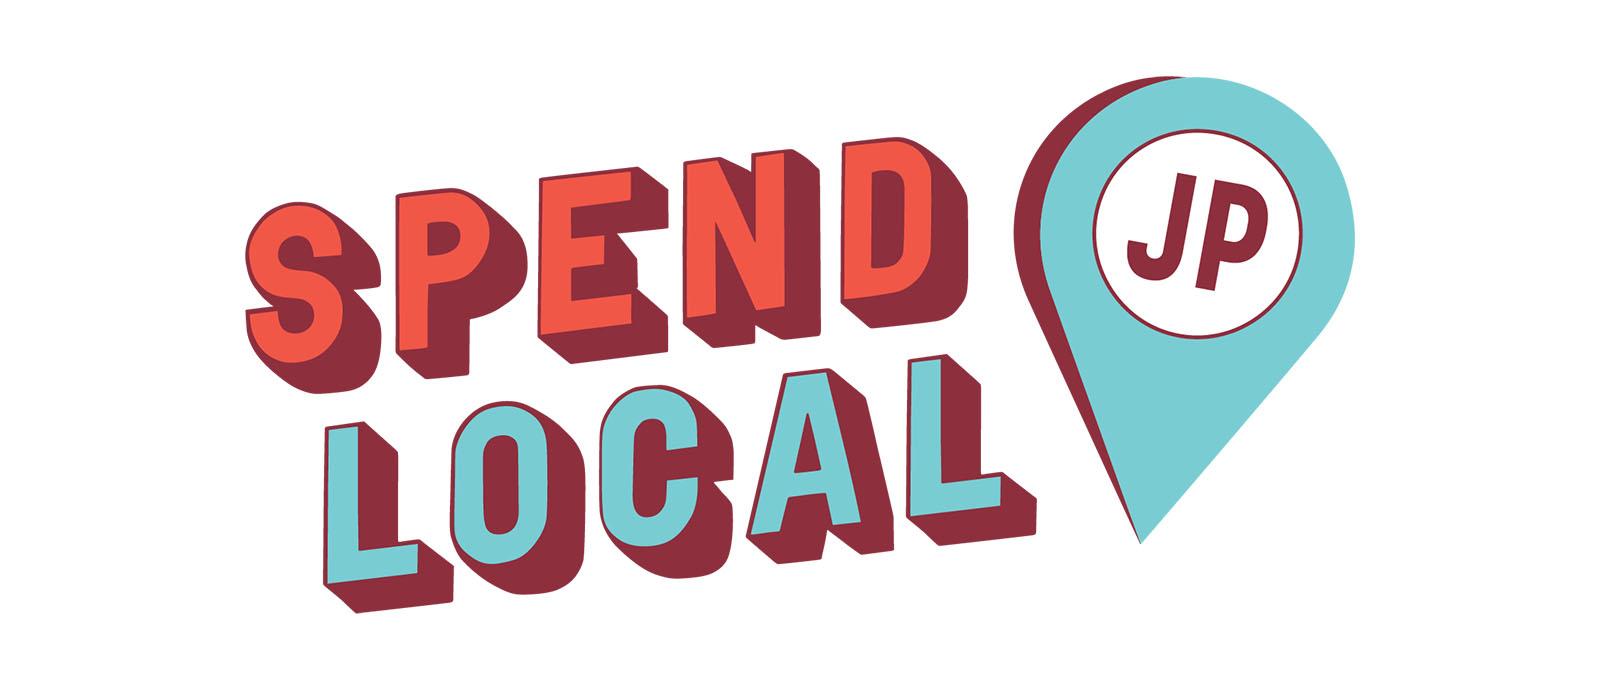 Spend Local JP